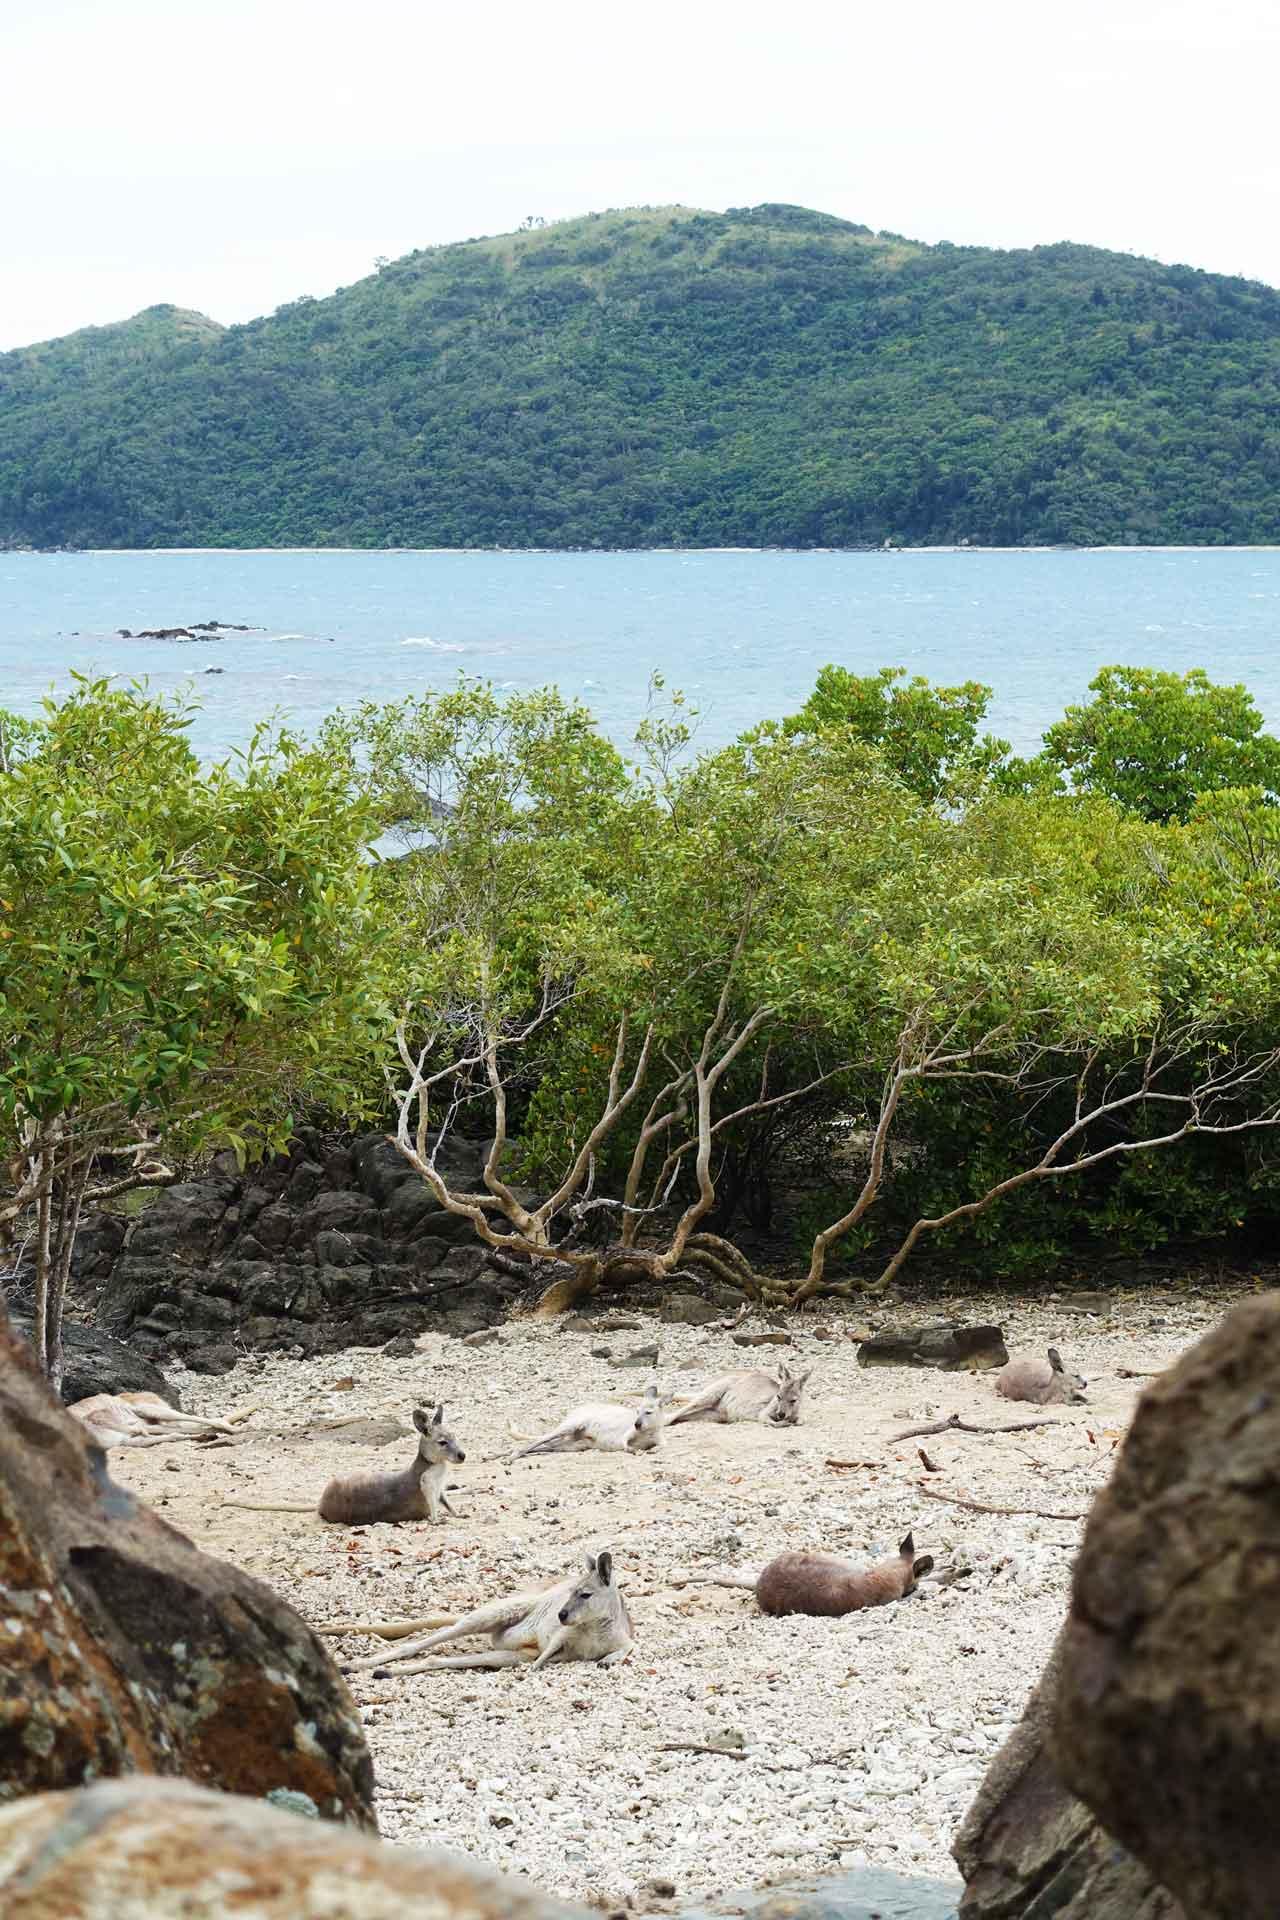 Kangaroos on Daydream Island